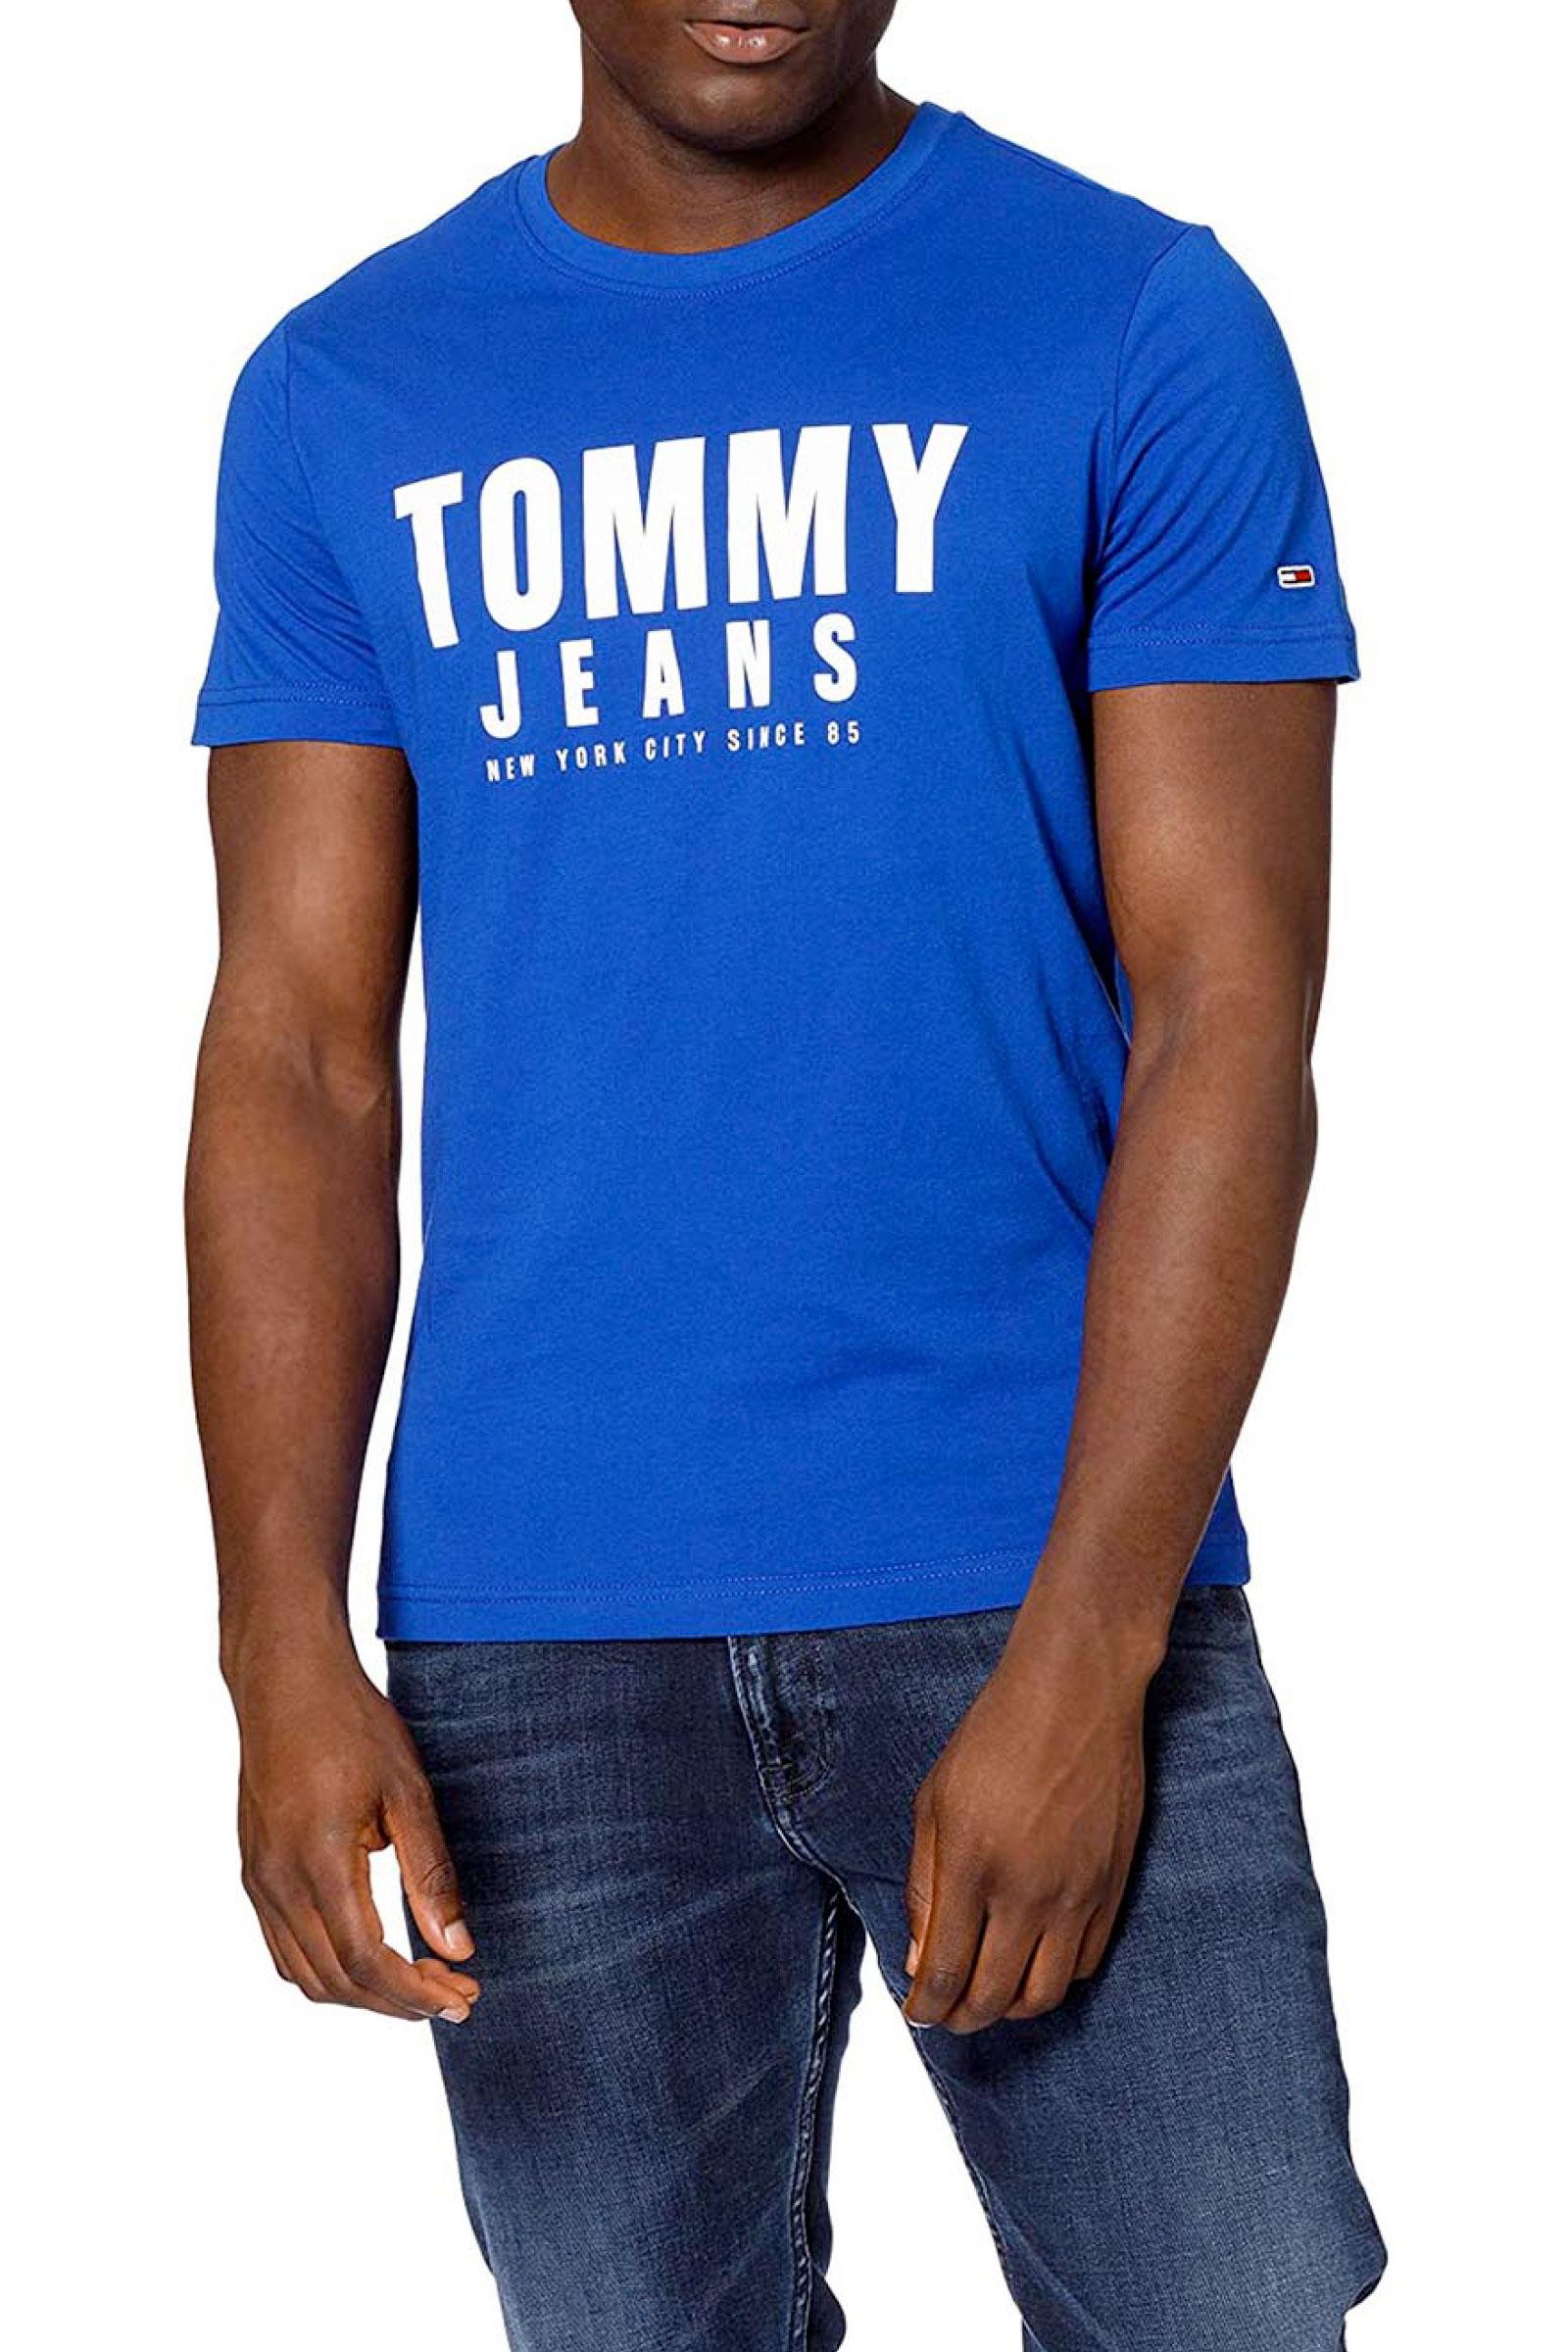 TOMMY JEANS T-Shirt Uomo TOMMY JEANS | T-Shirt | DM0DM10243C65